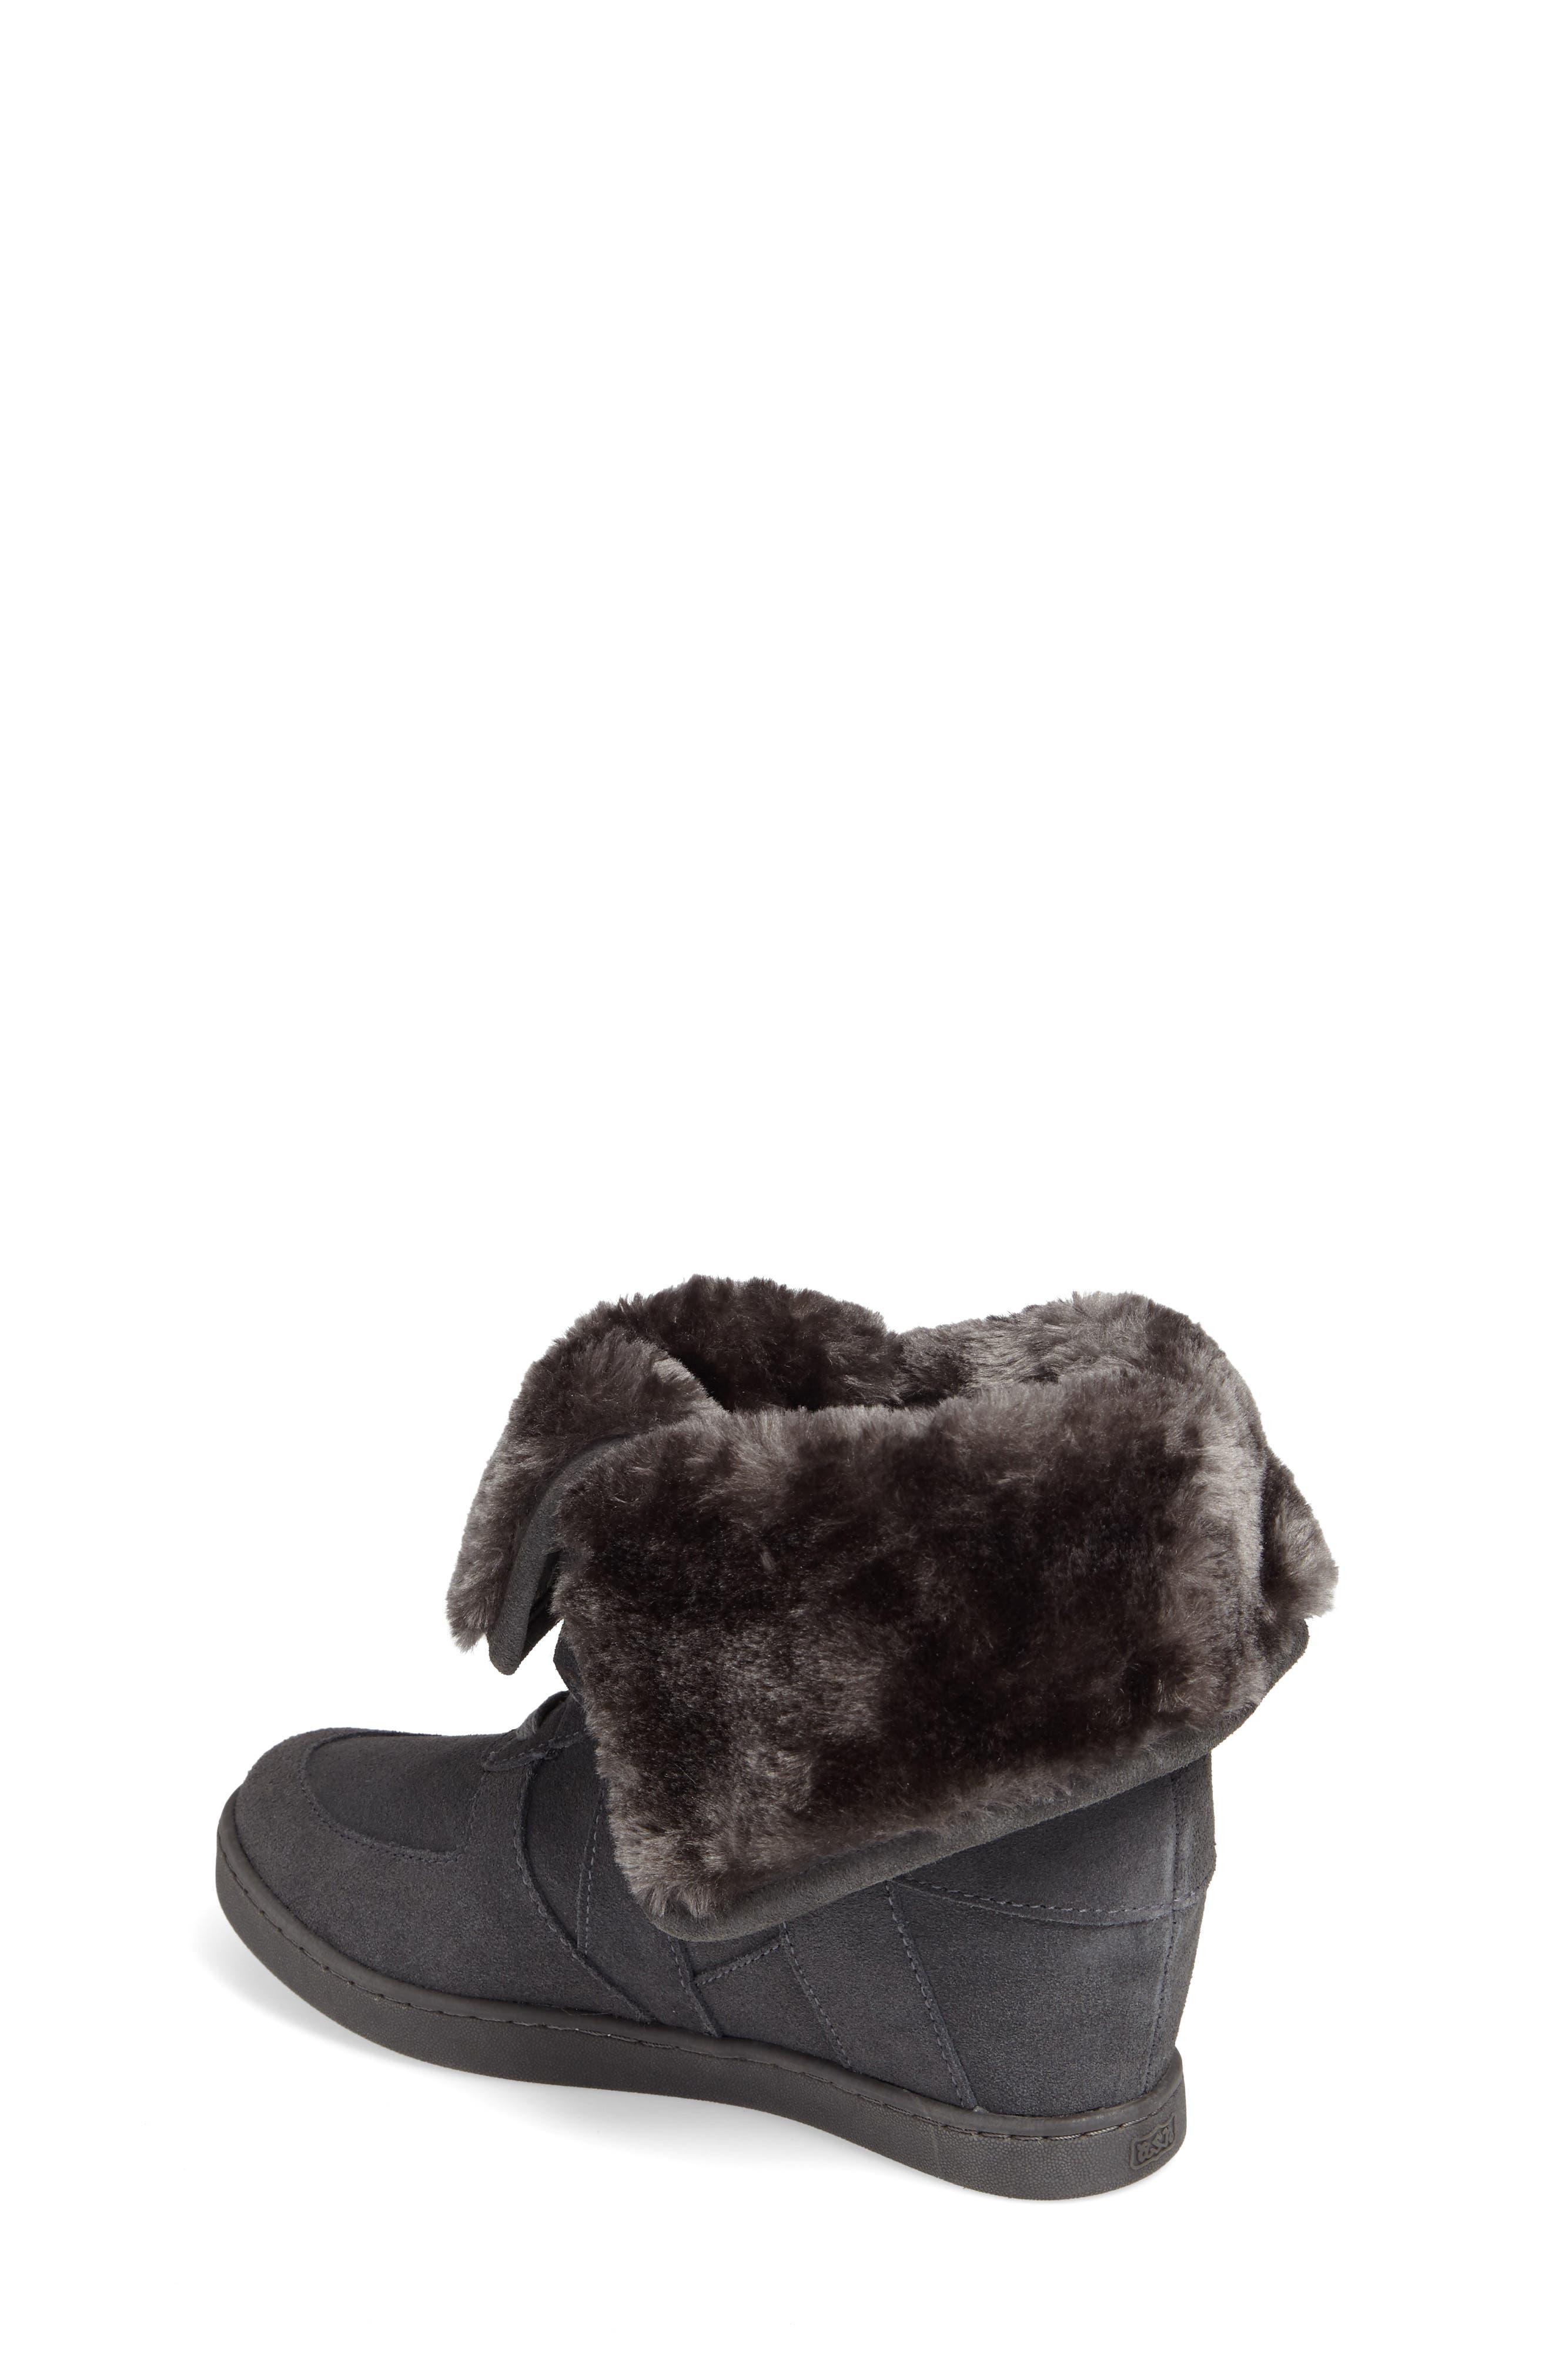 Alternate Image 2  - Ash Boogie Beaver Faux Fur Cuffed Bootie (Toddler, Little Kid & Big Kid)